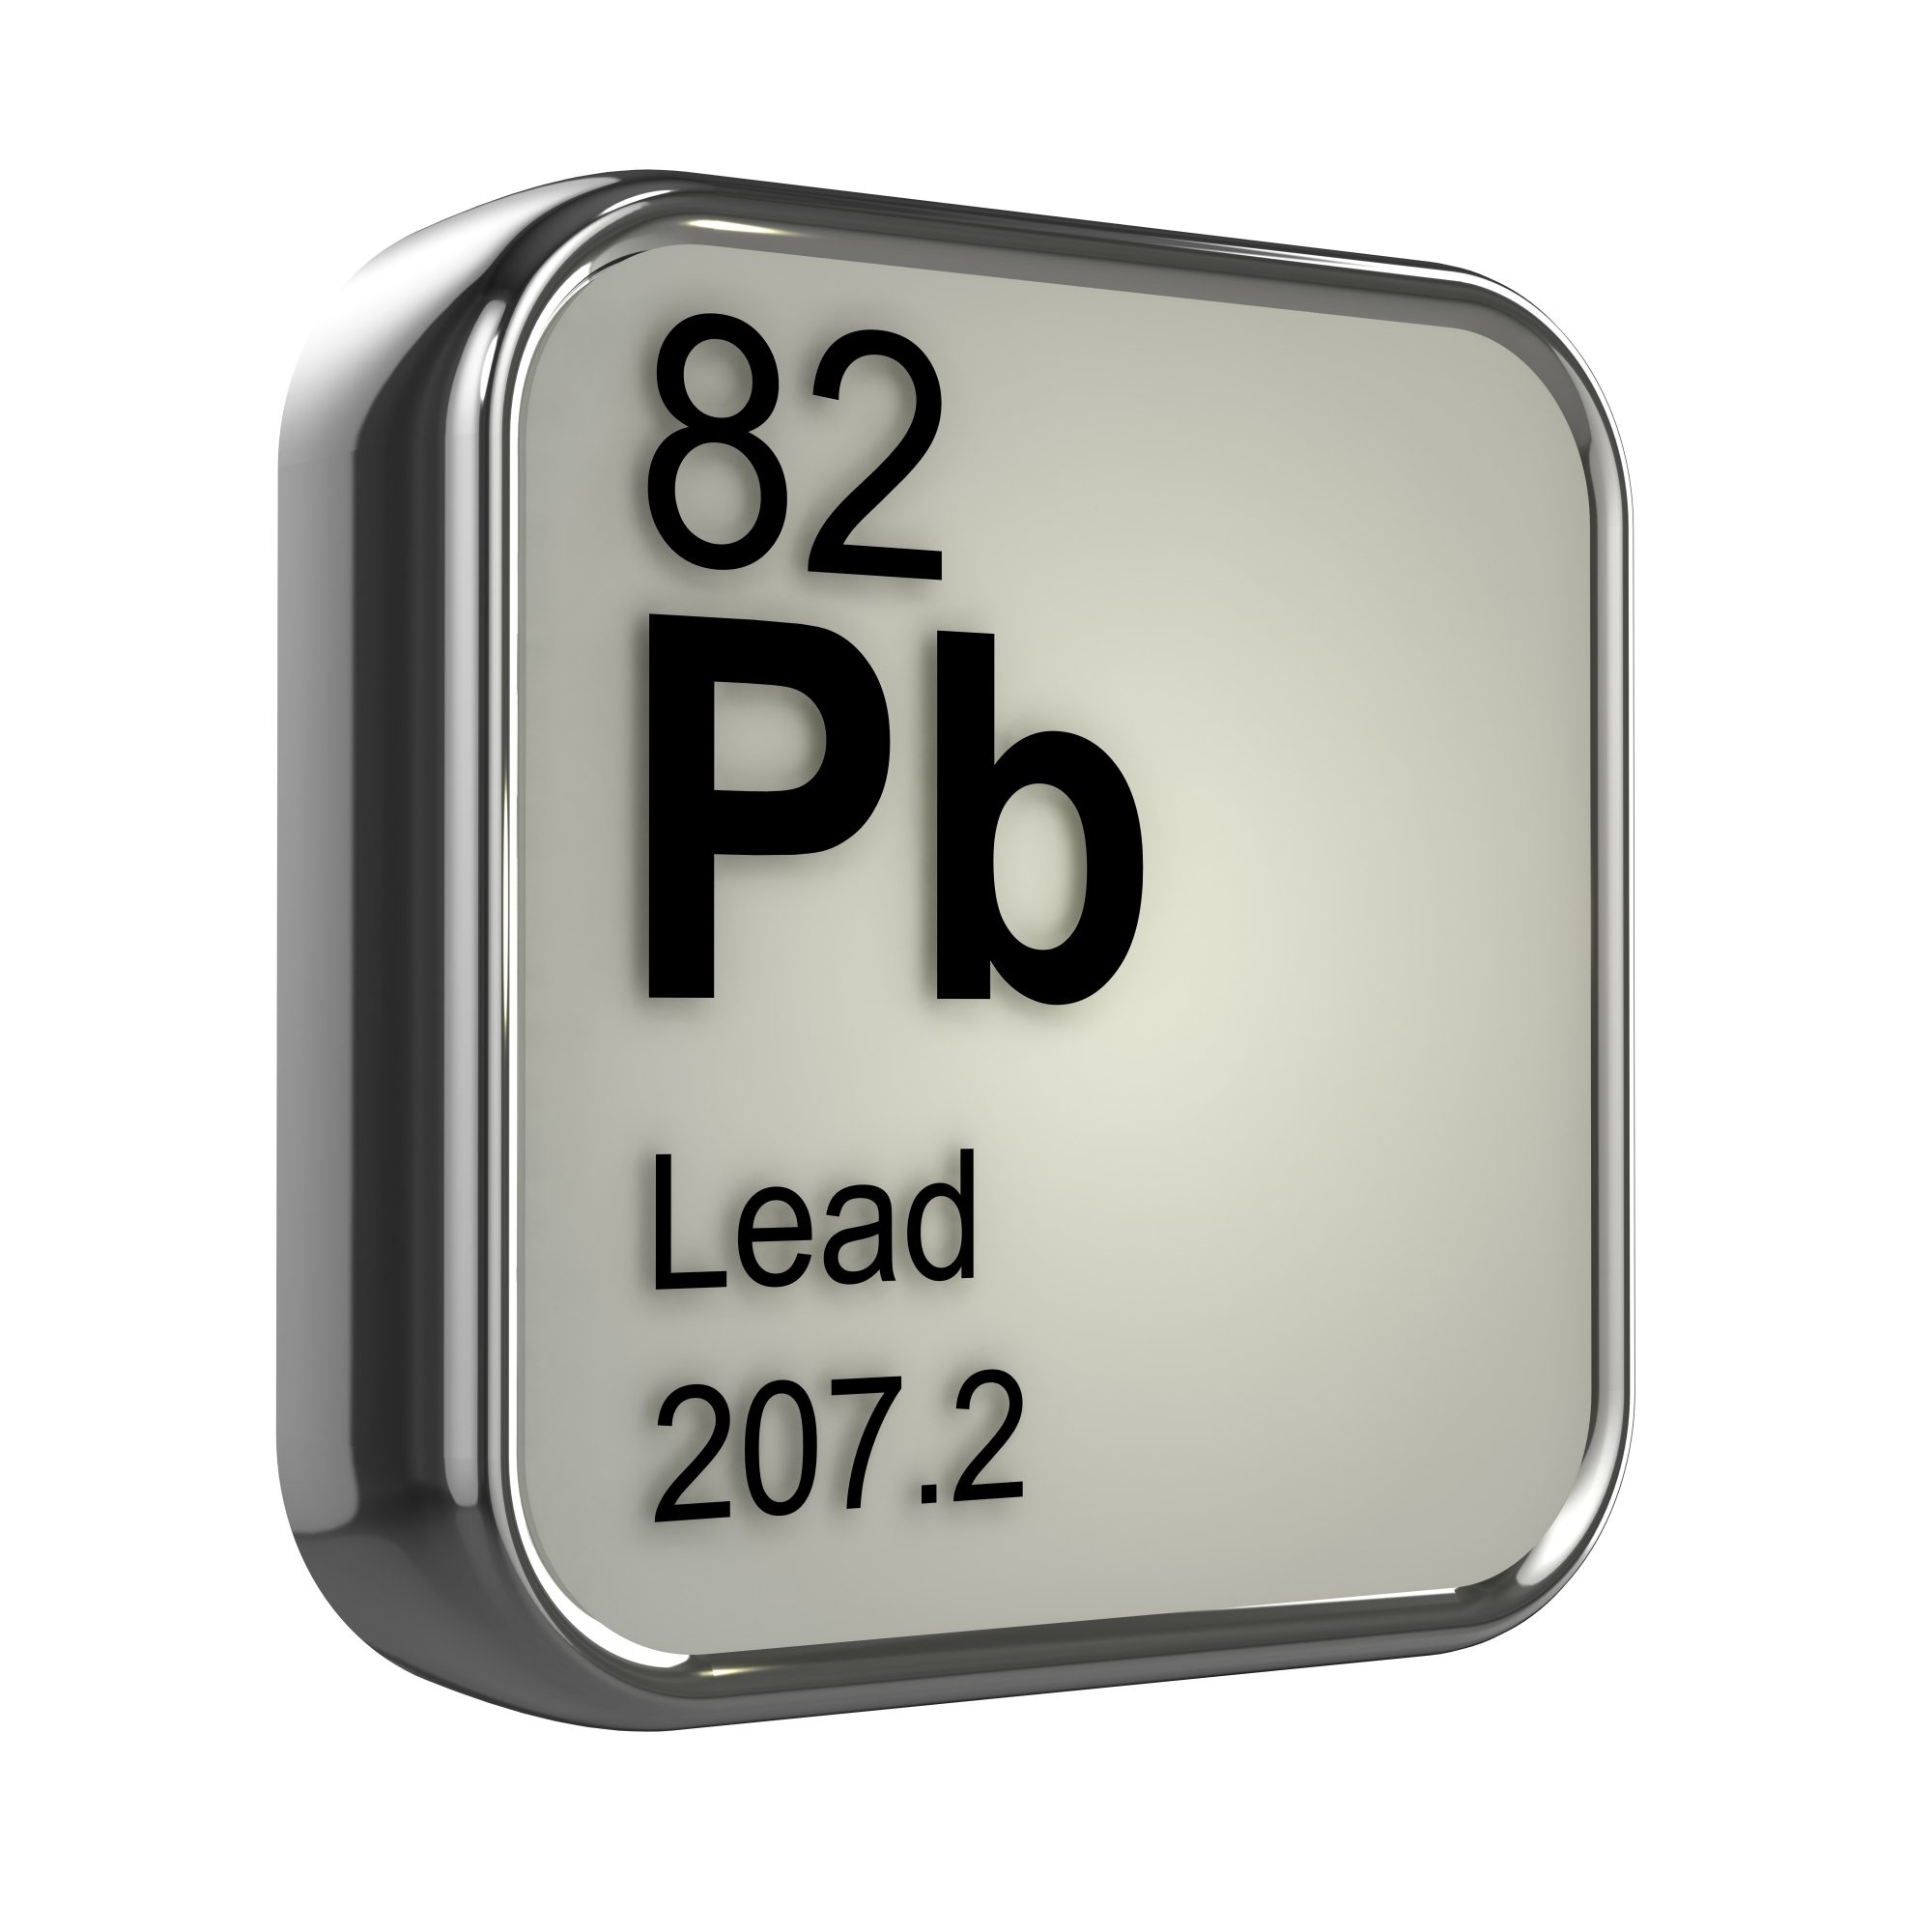 Lead (Pb) © Toxno